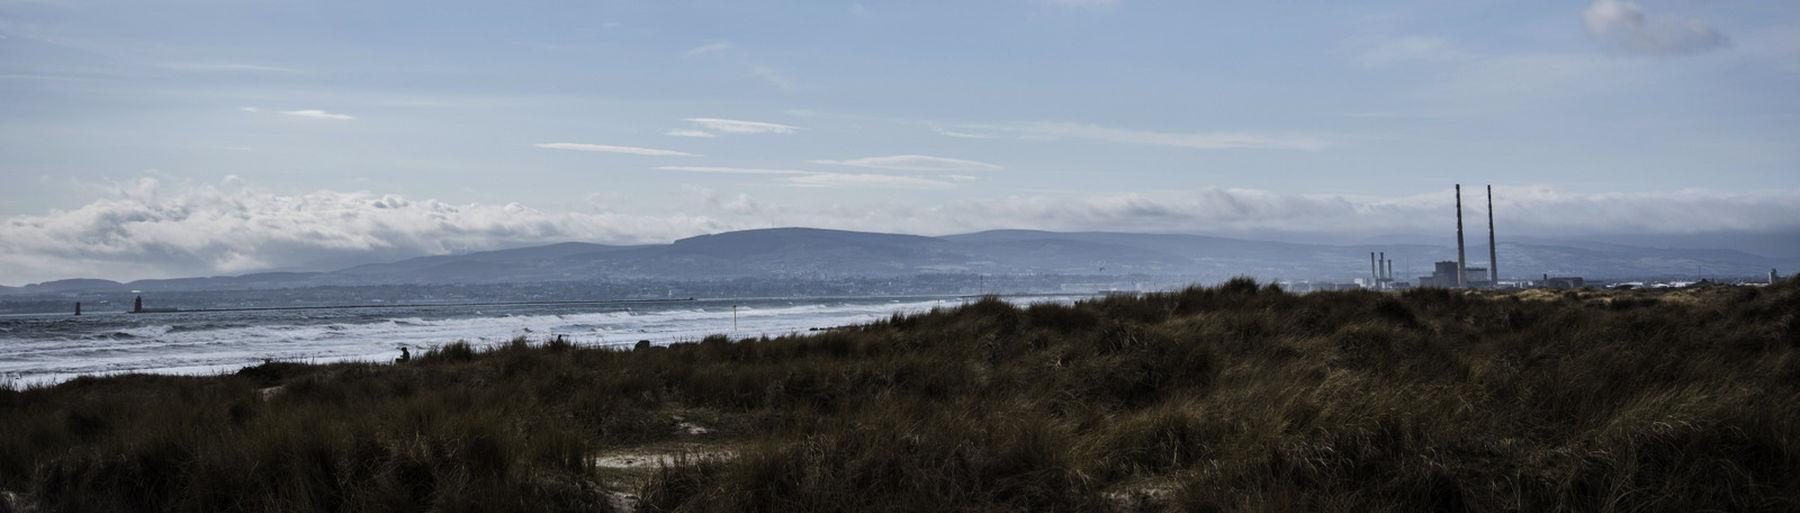 Landascape Dublin Popular Photos Relaxing The Big Smoke Ireland Taking Photos EyeEm Best Shots Nature Beach